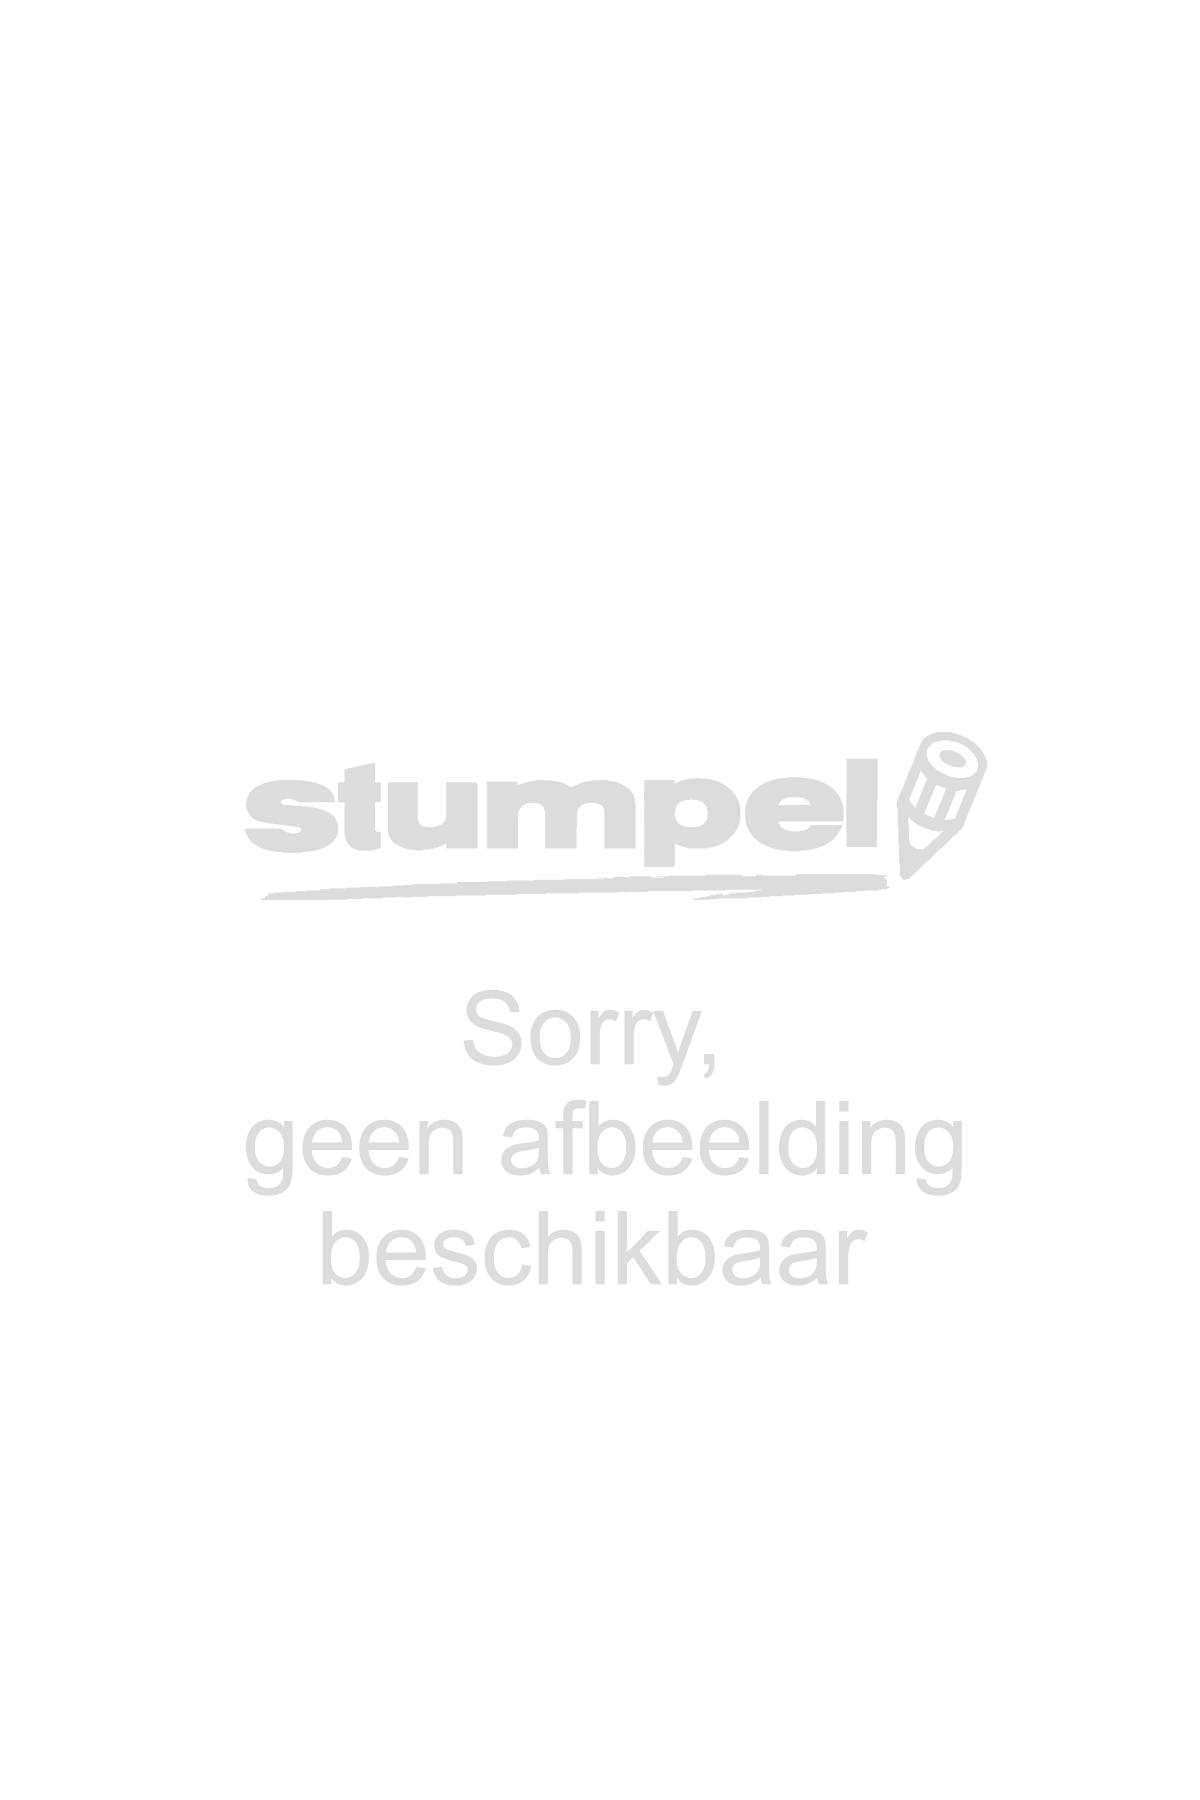 balpenvulling-schneider-755-slider-jumbo-m-zwart-614335